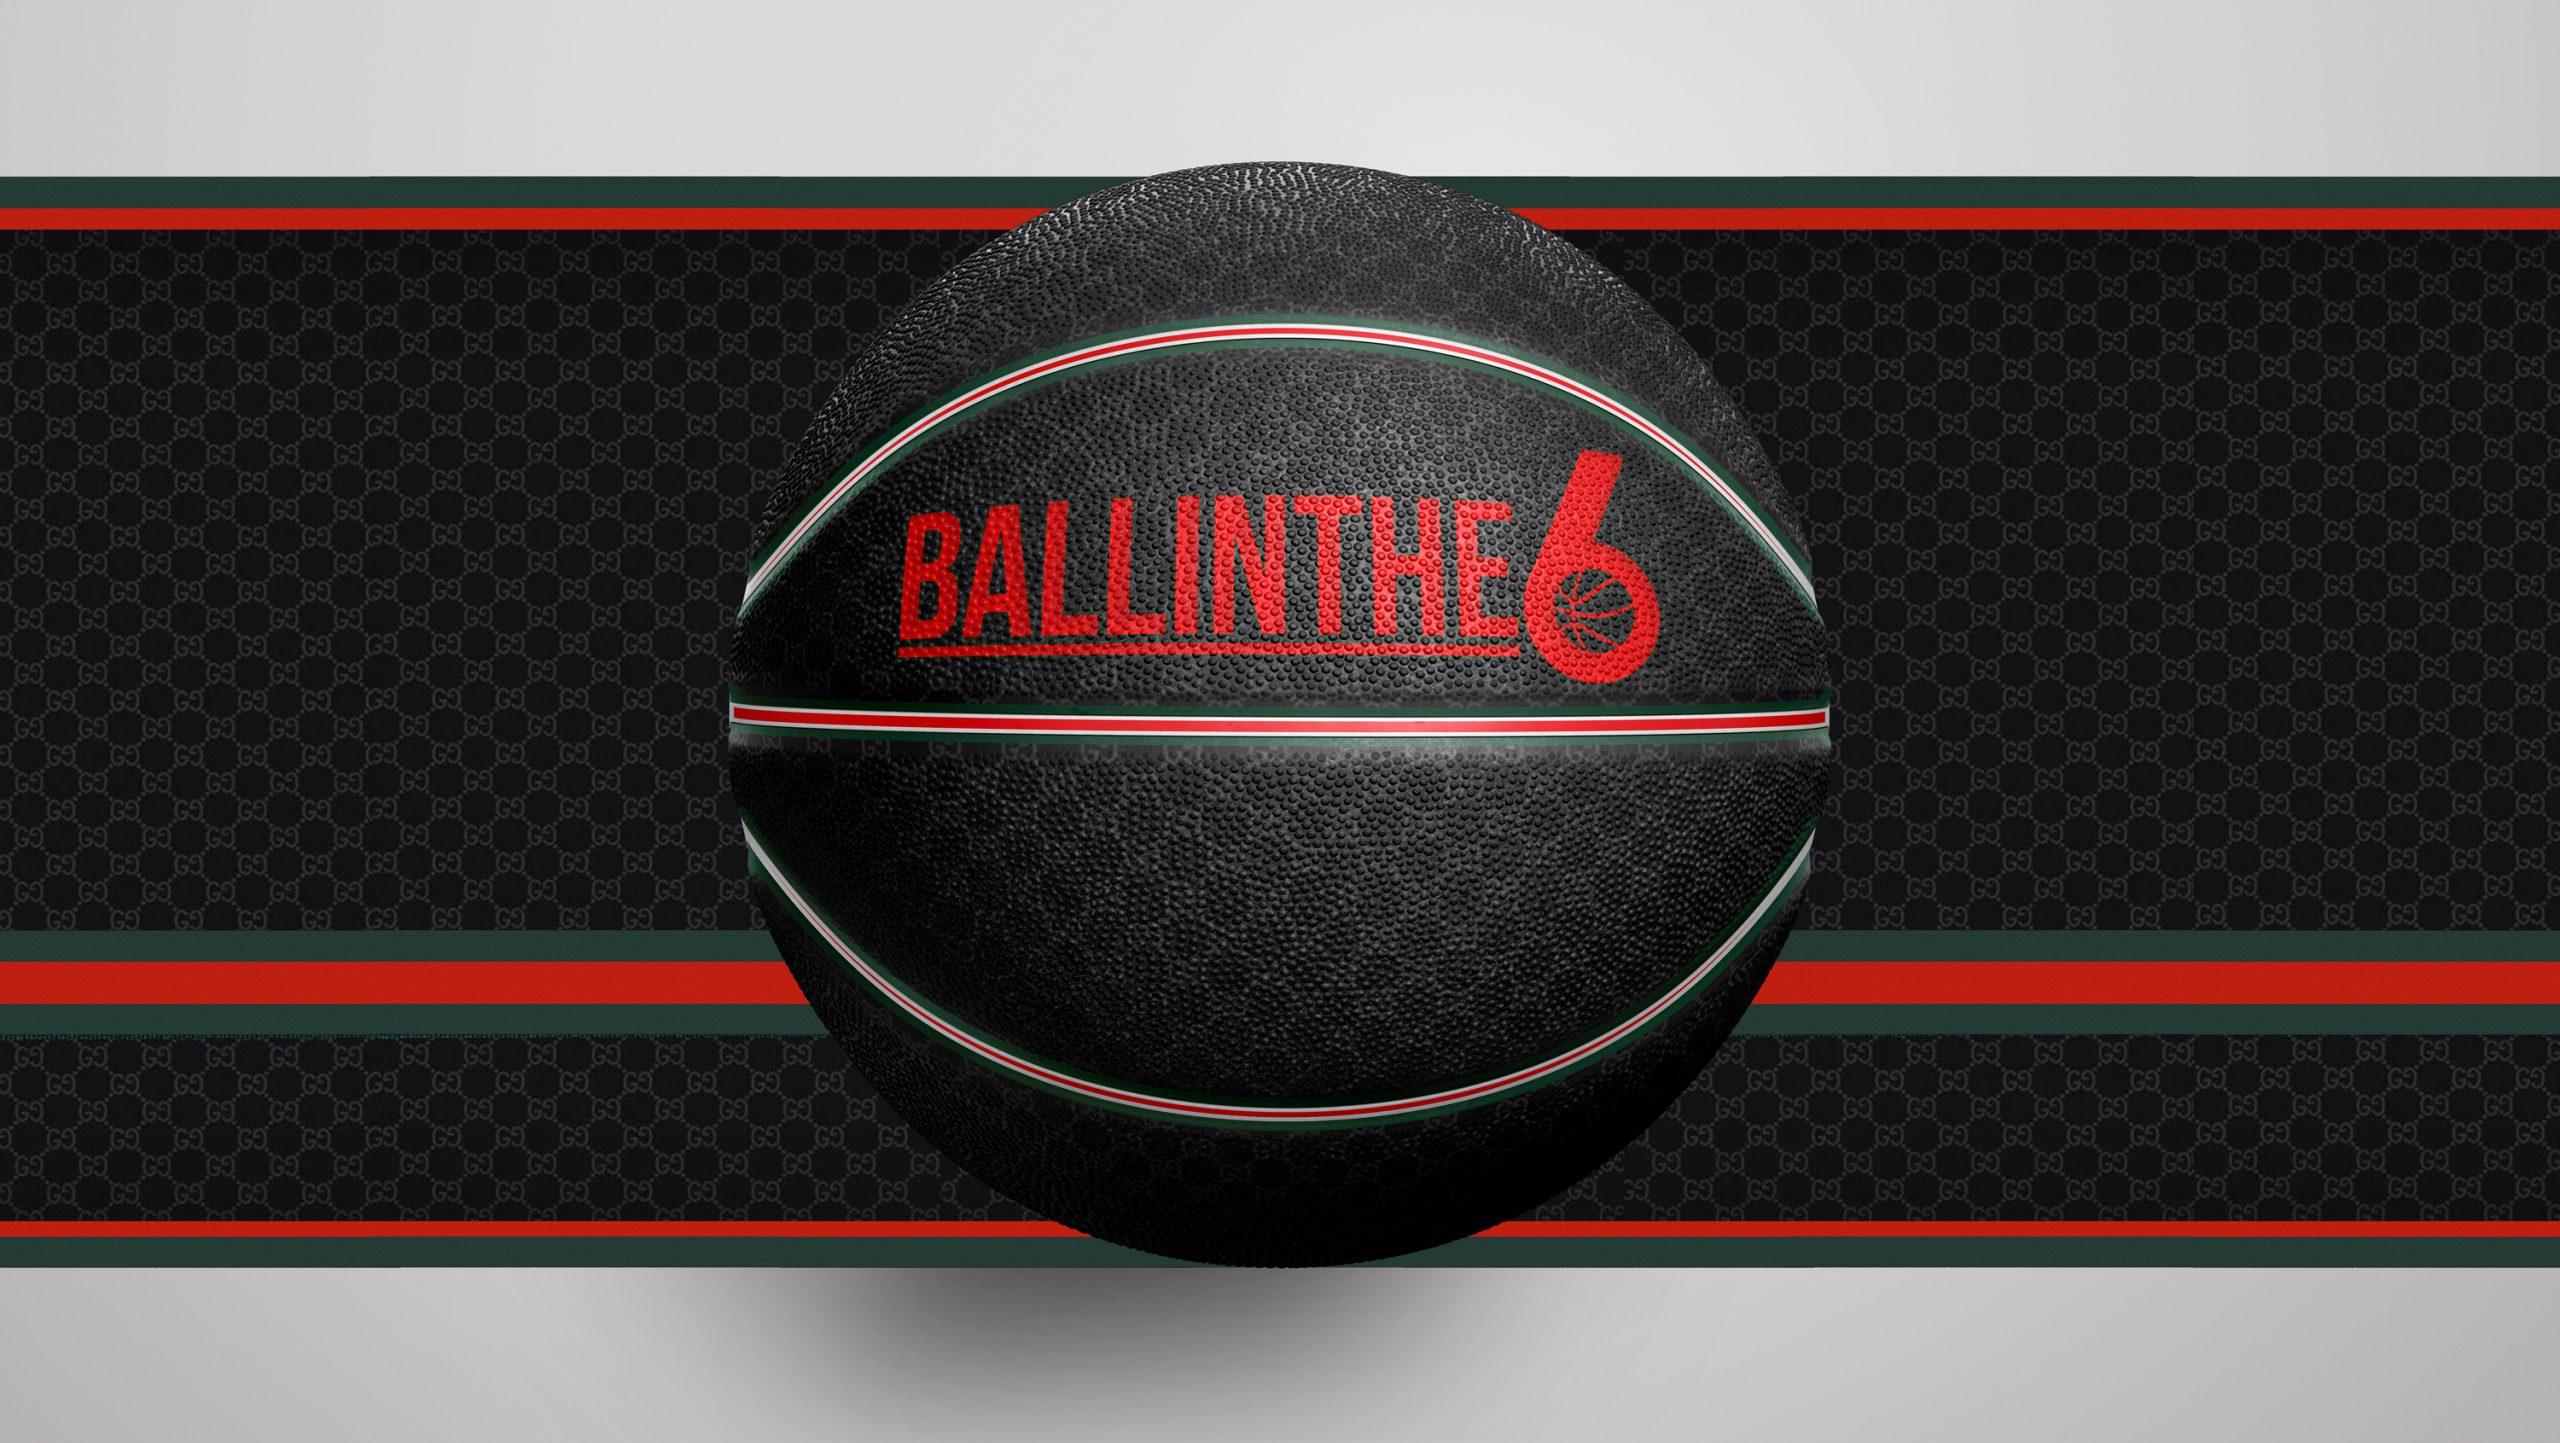 Gucci-ball-in-the-6-basketball-wallpaper-toronto-champions